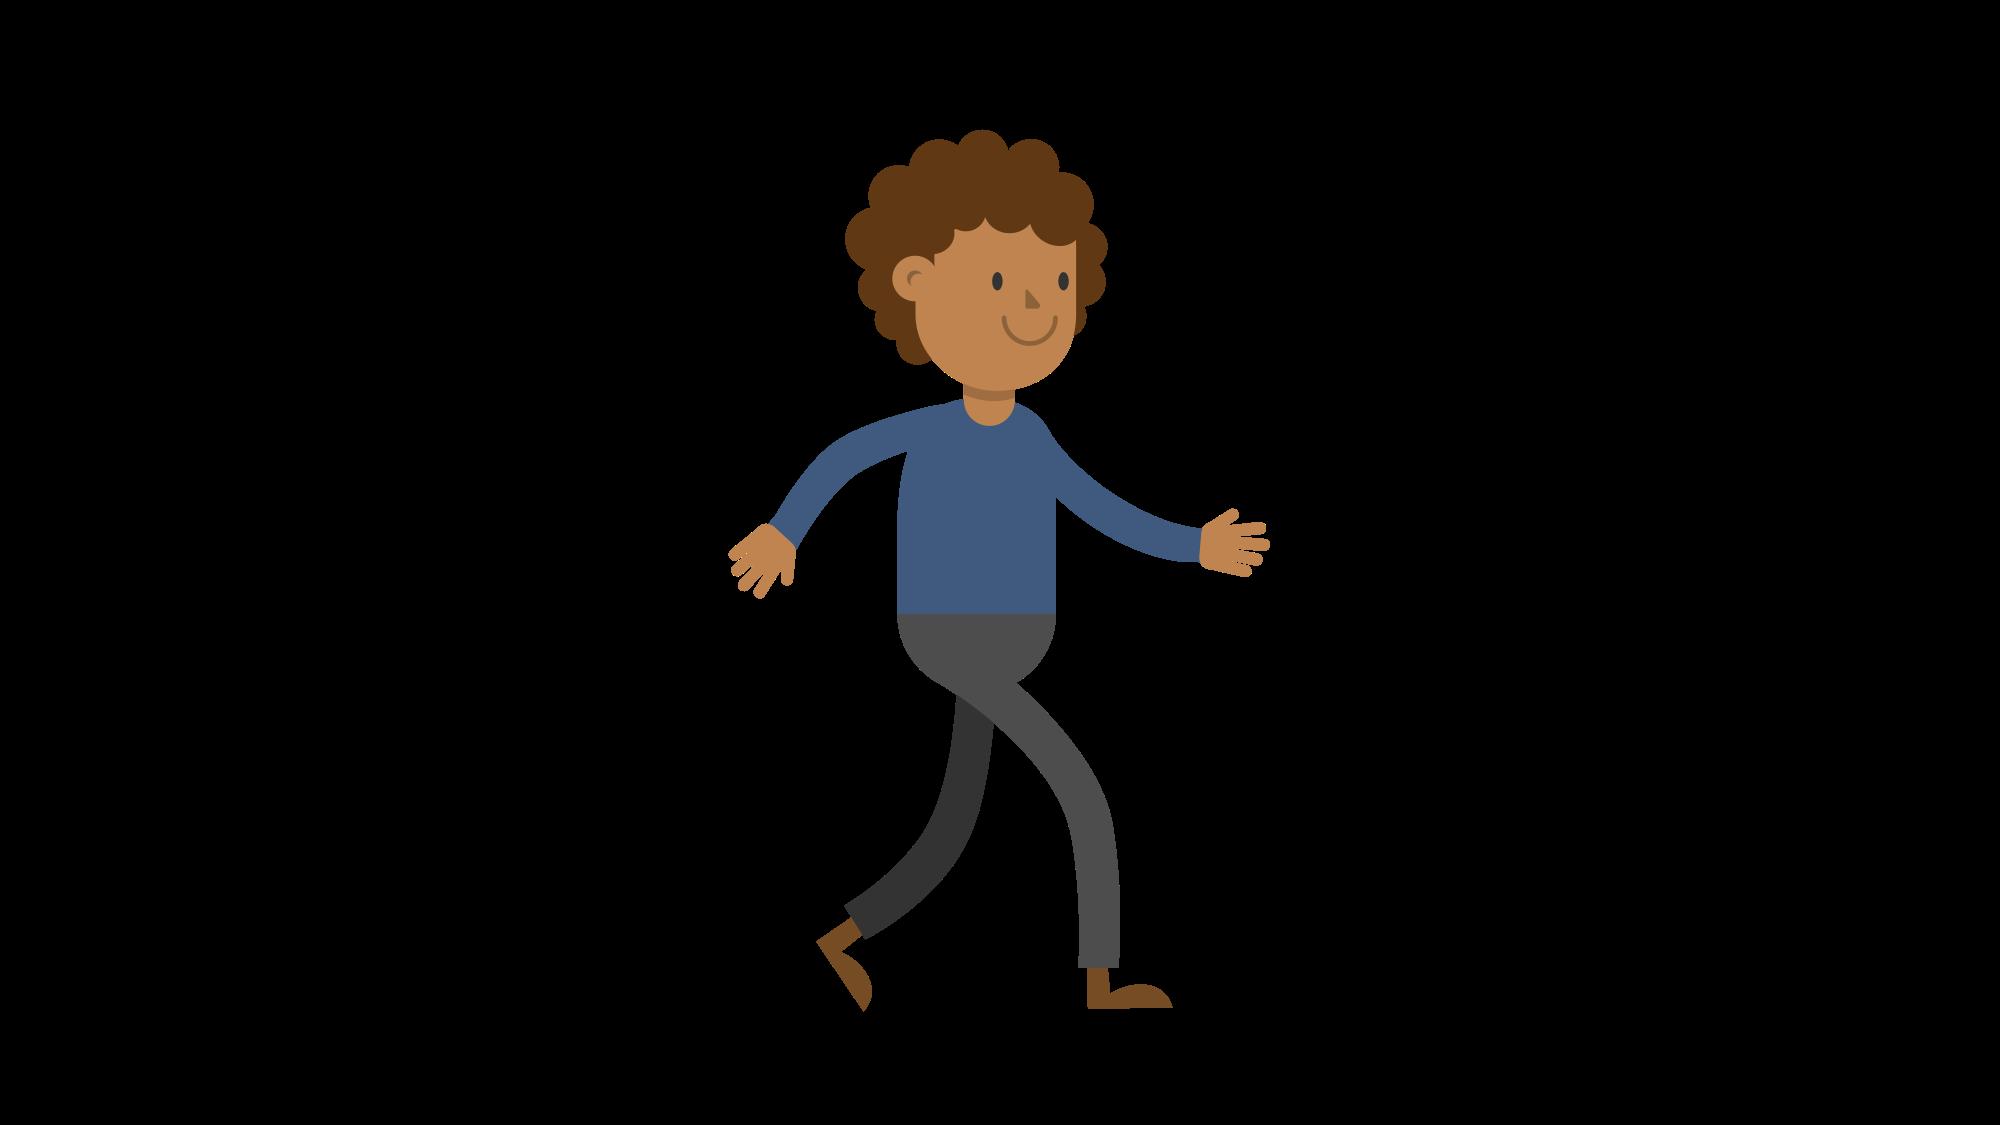 2000x1125 Fileblack Man Walking Cartoon Vector.svg